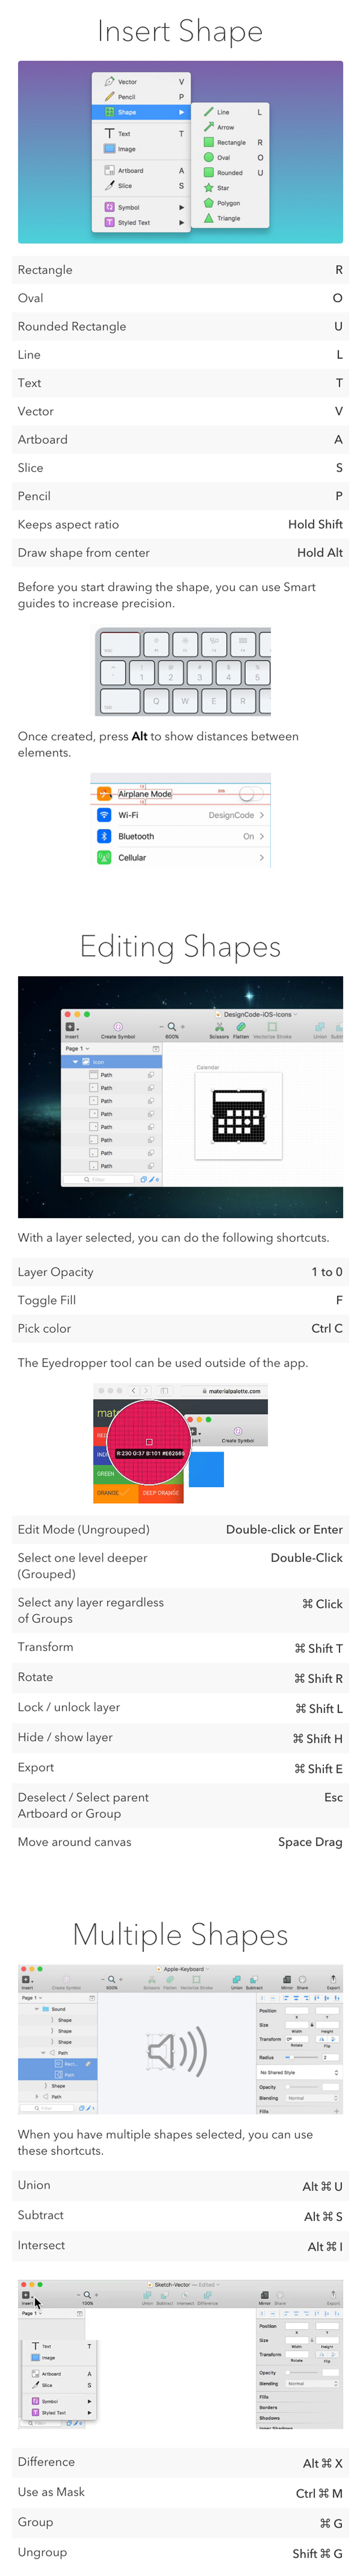 Sketchユーザー必見!Sketchキーボードショートカットのわかりやすいまとめ「Sketch Keyboard Shortcuts」